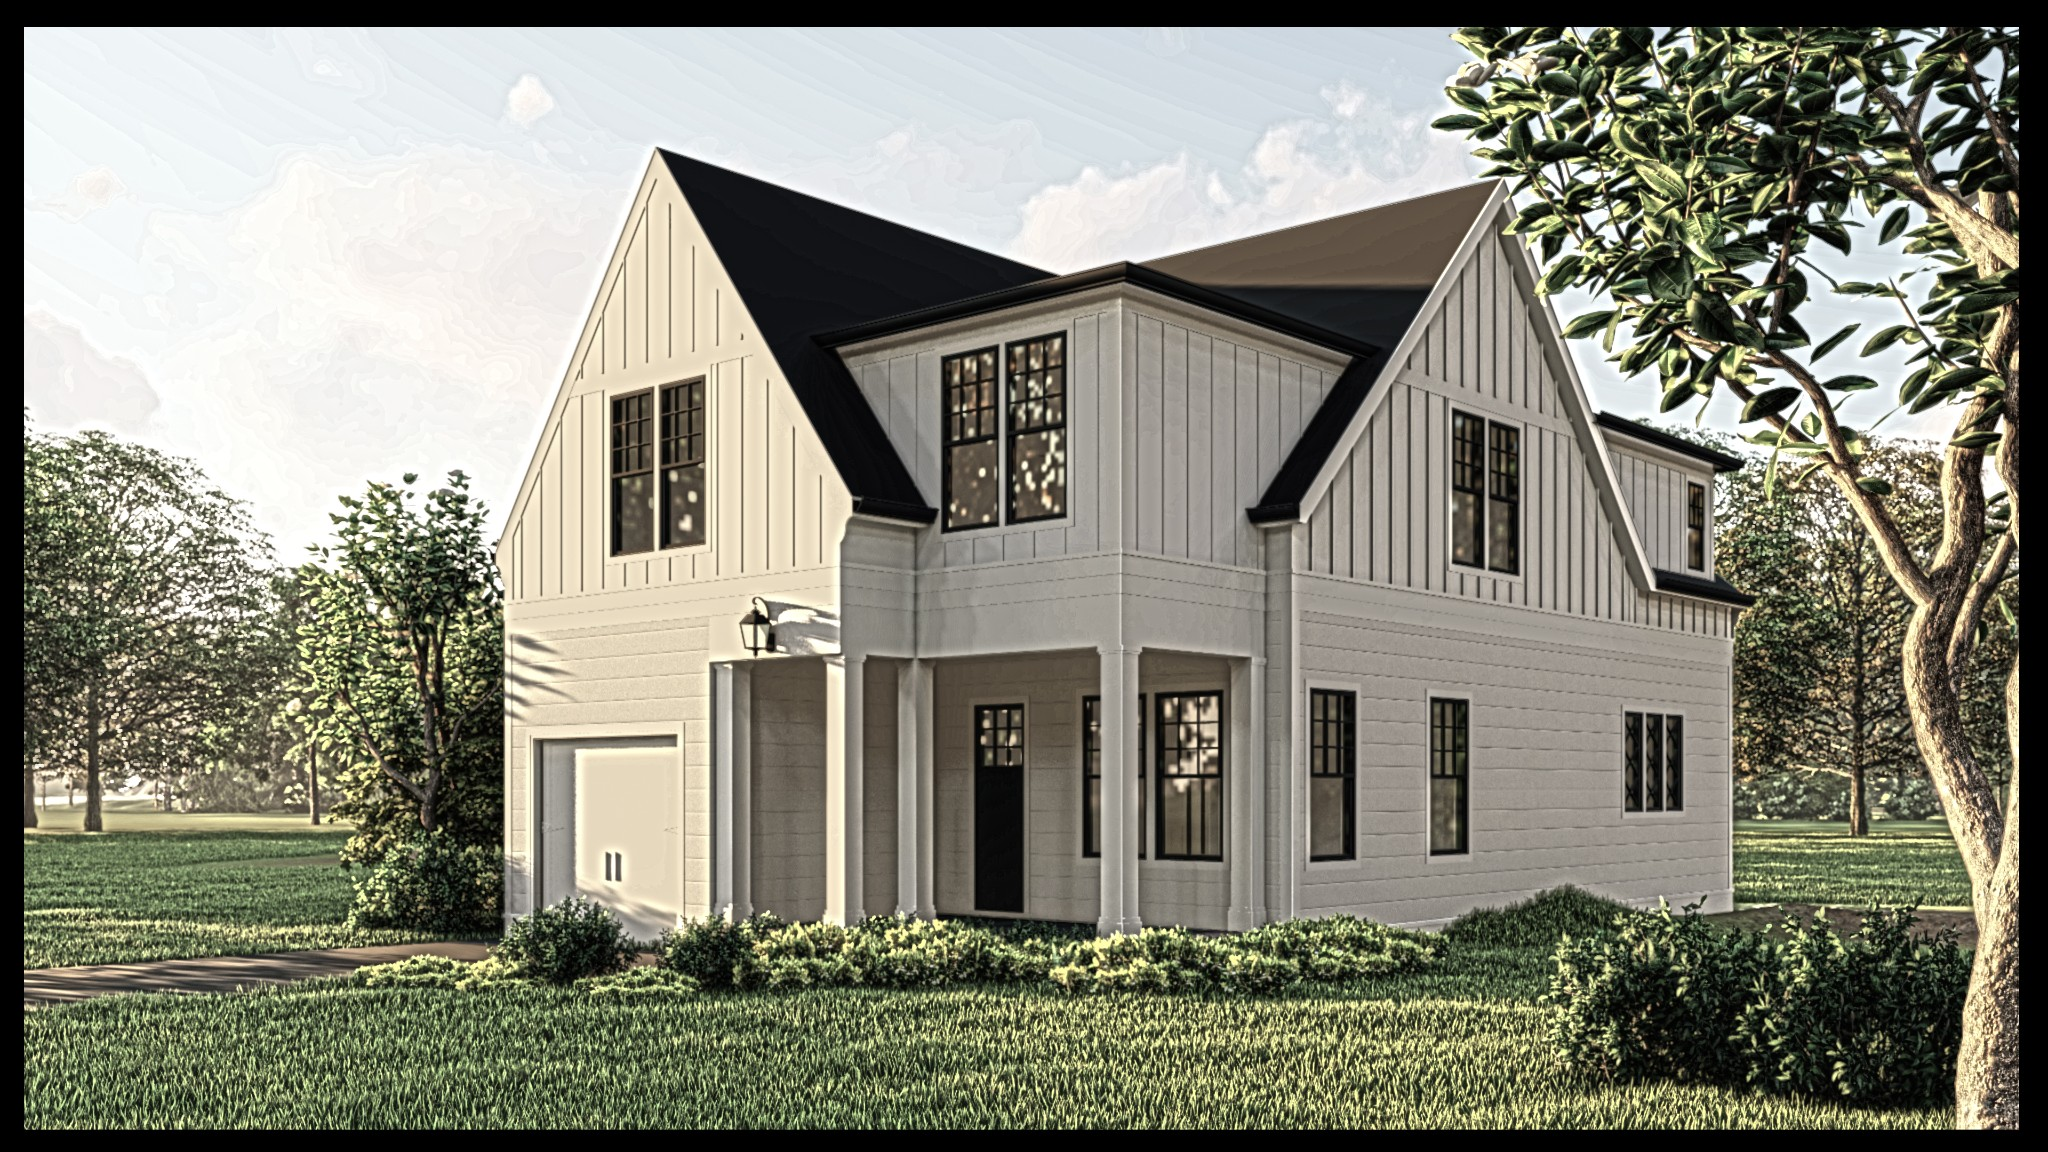 1505 60th Ave, N, Nashville, TN 37209 - Nashville, TN real estate listing